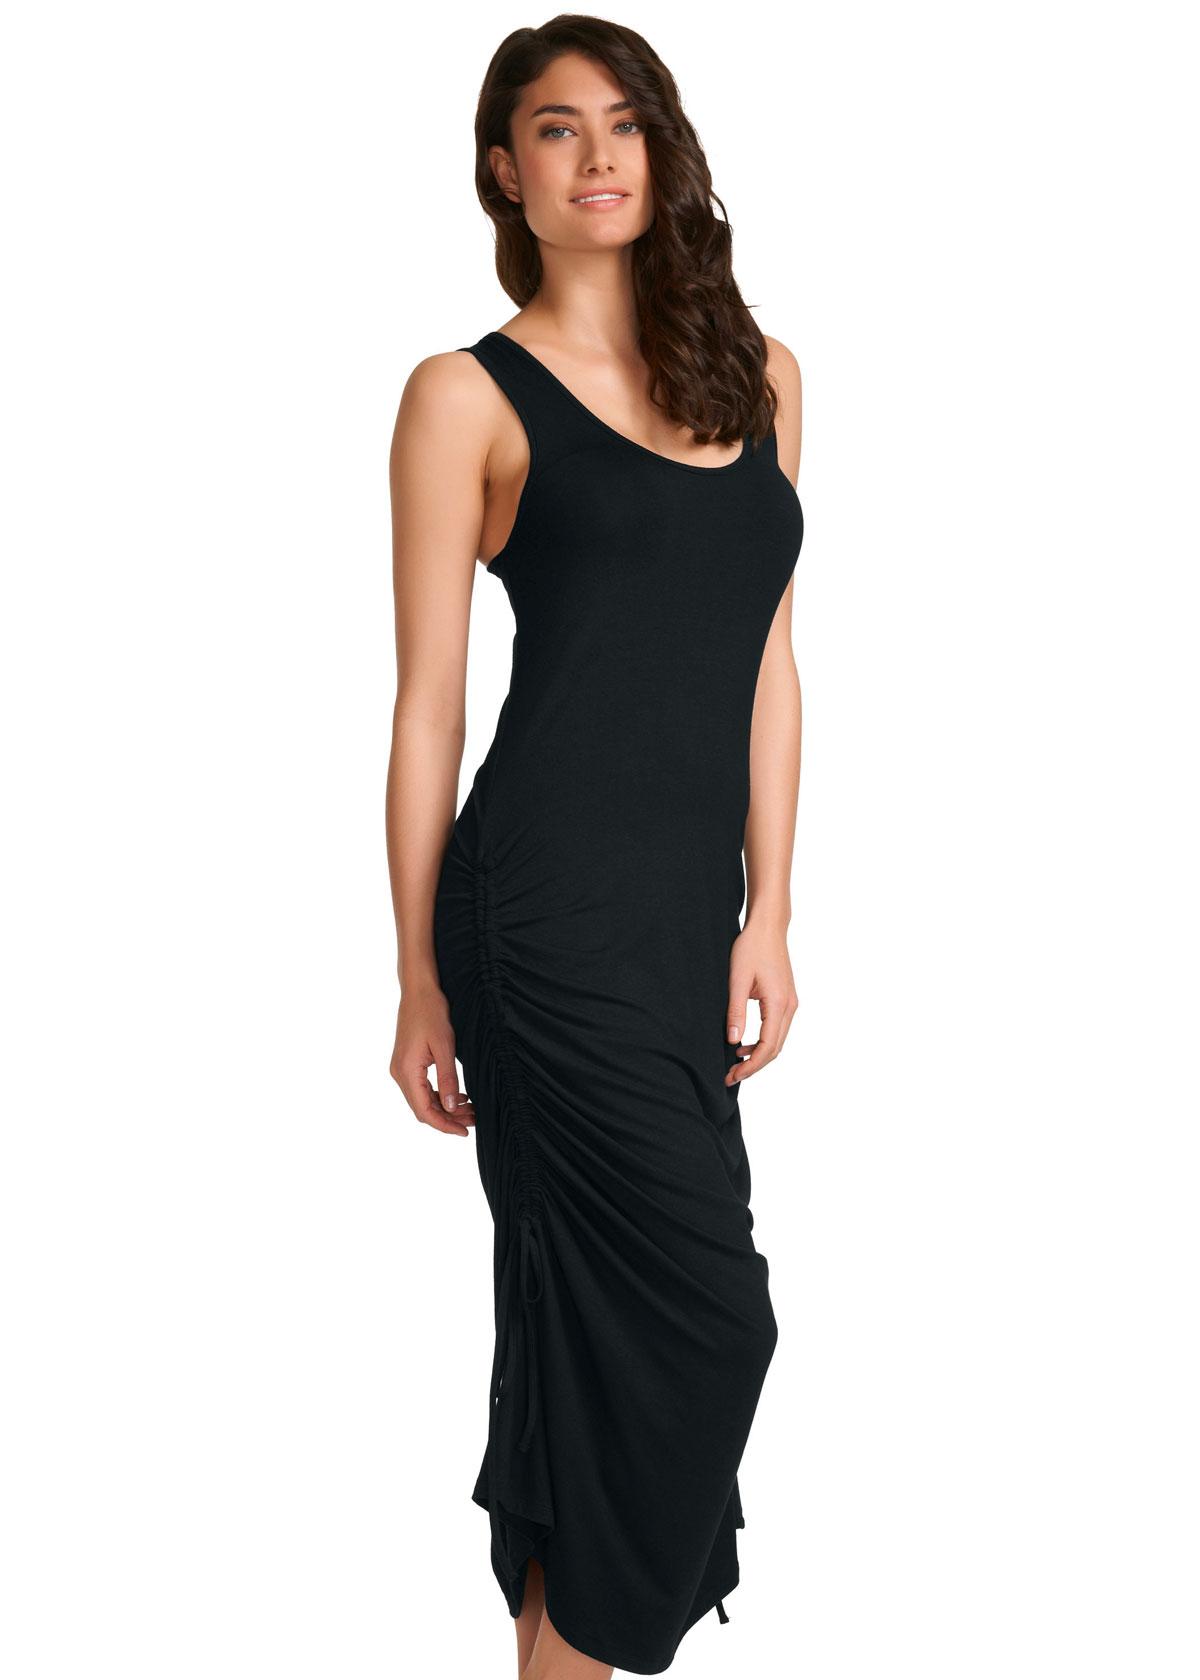 Can Short Girls Wear Long Dresses : Simple Guide To Choosing